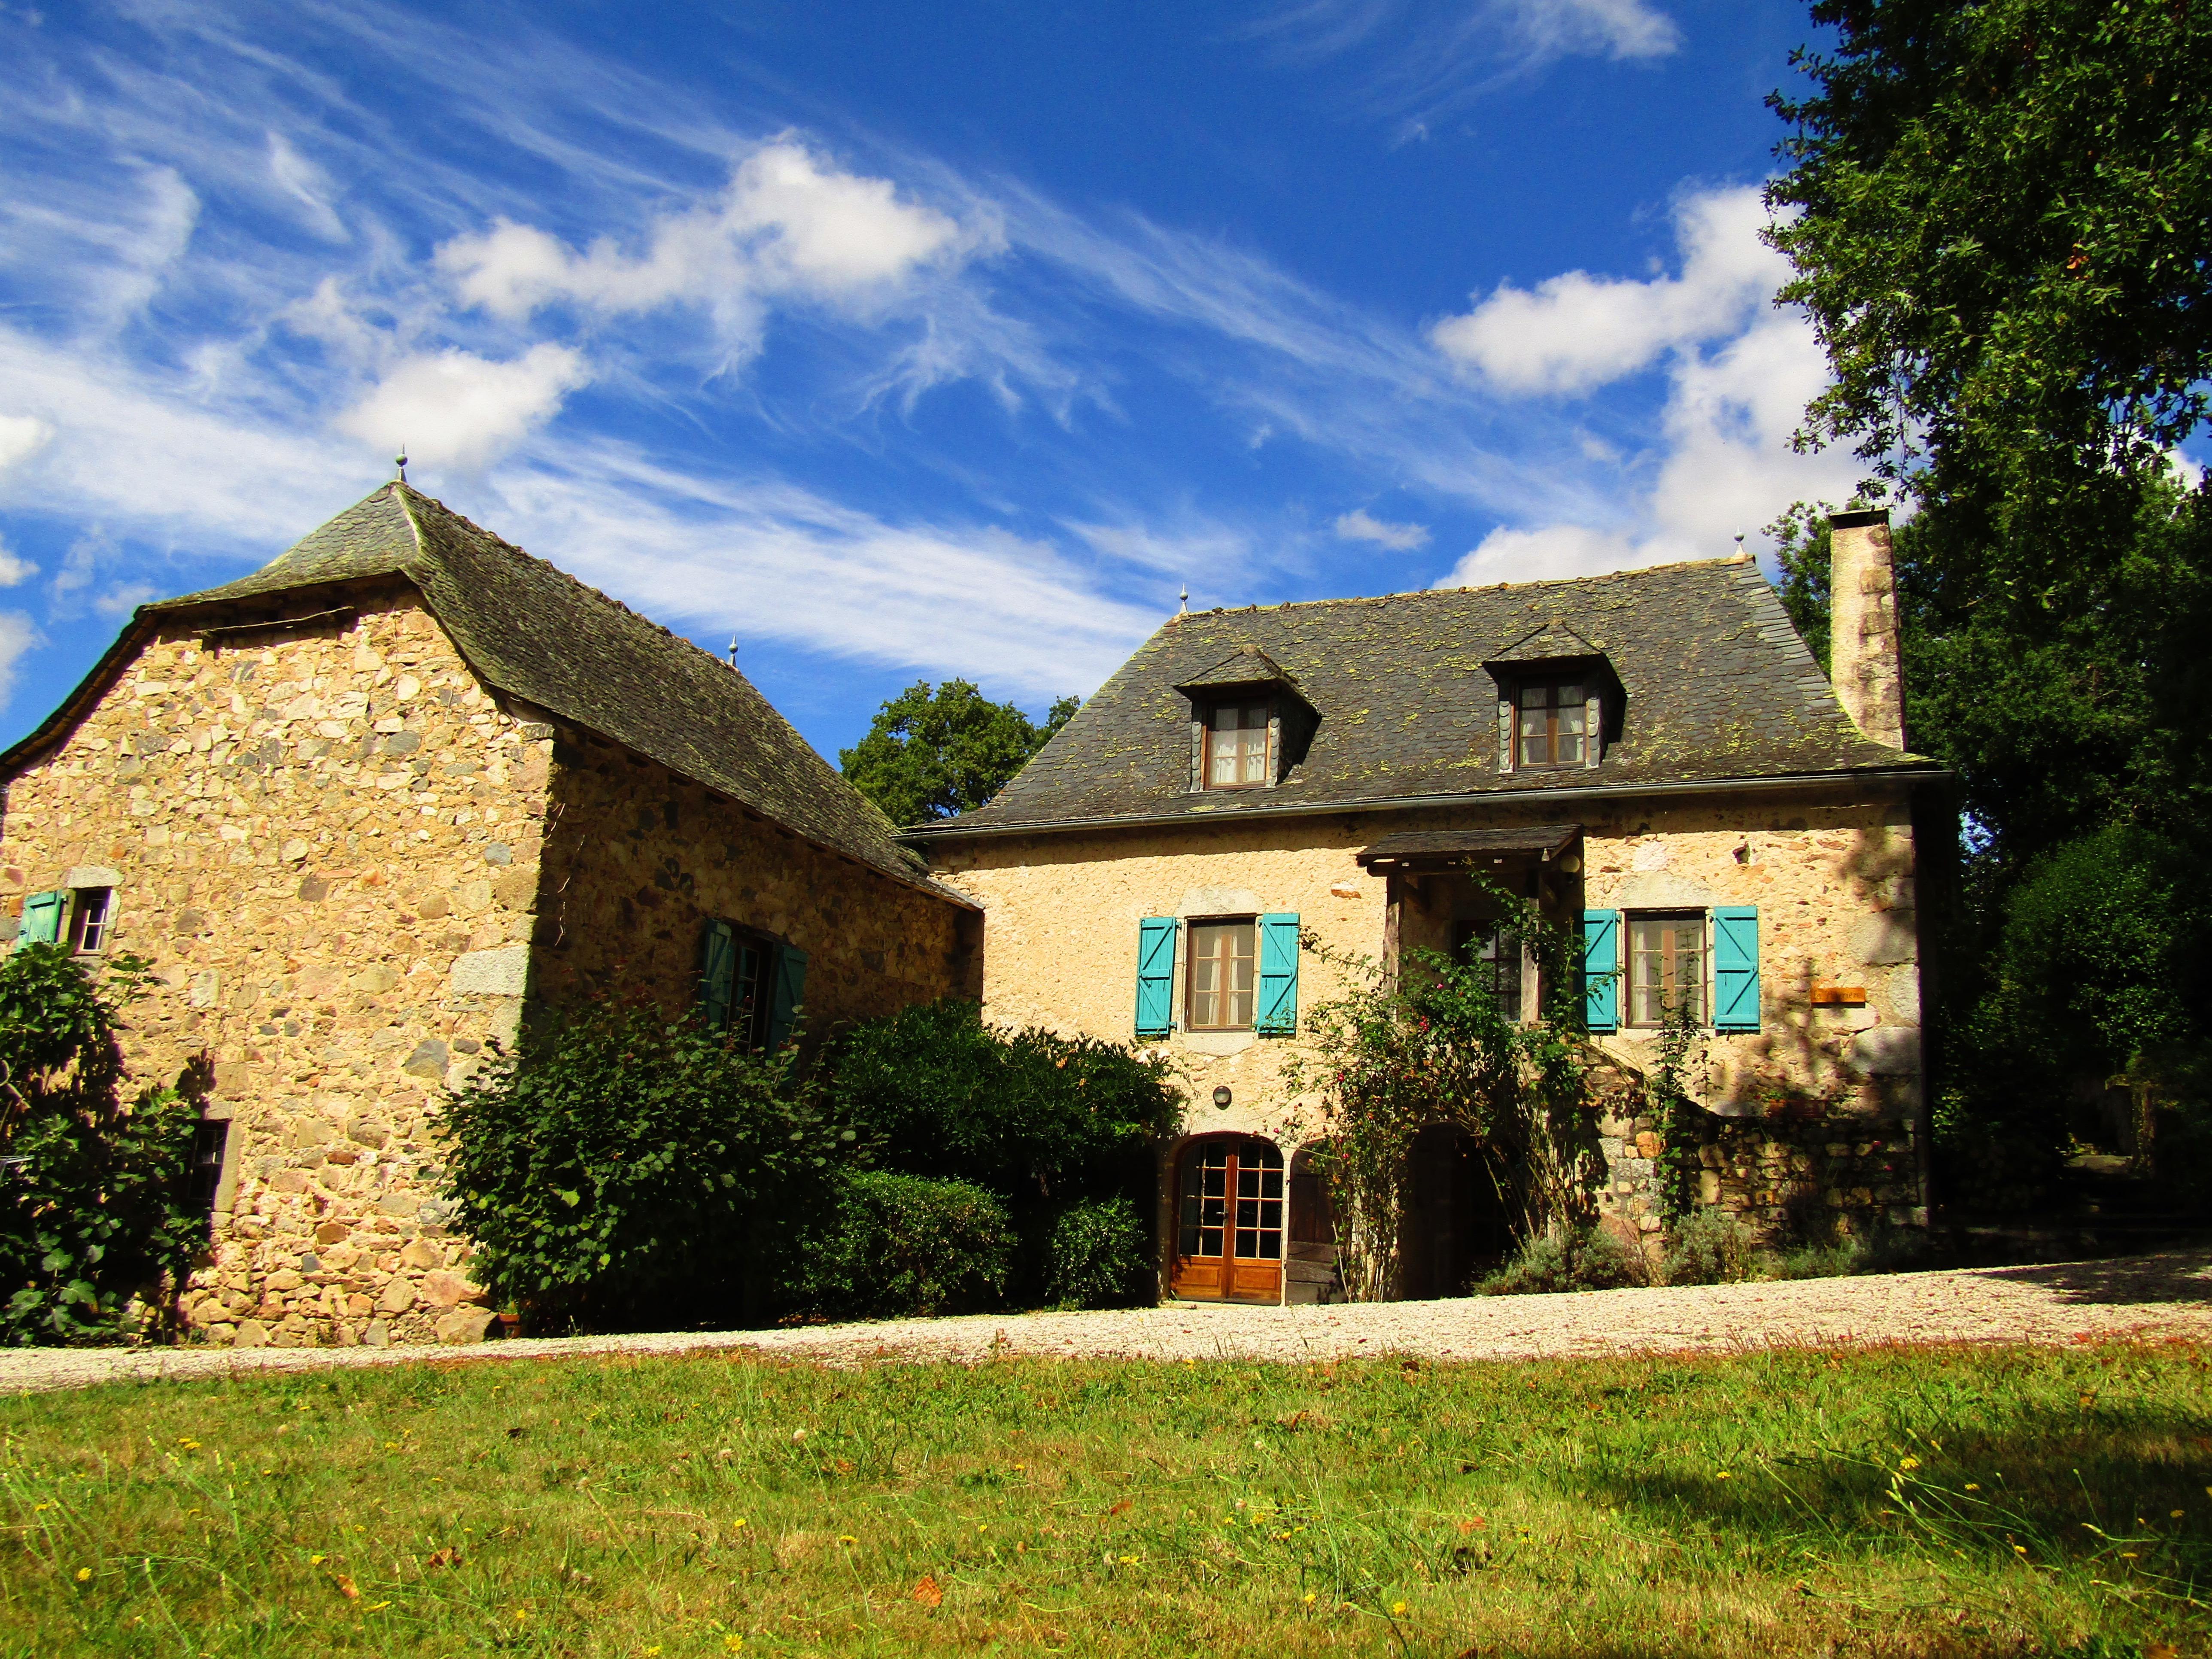 Intalnirea Femei Farmer Aveyron)